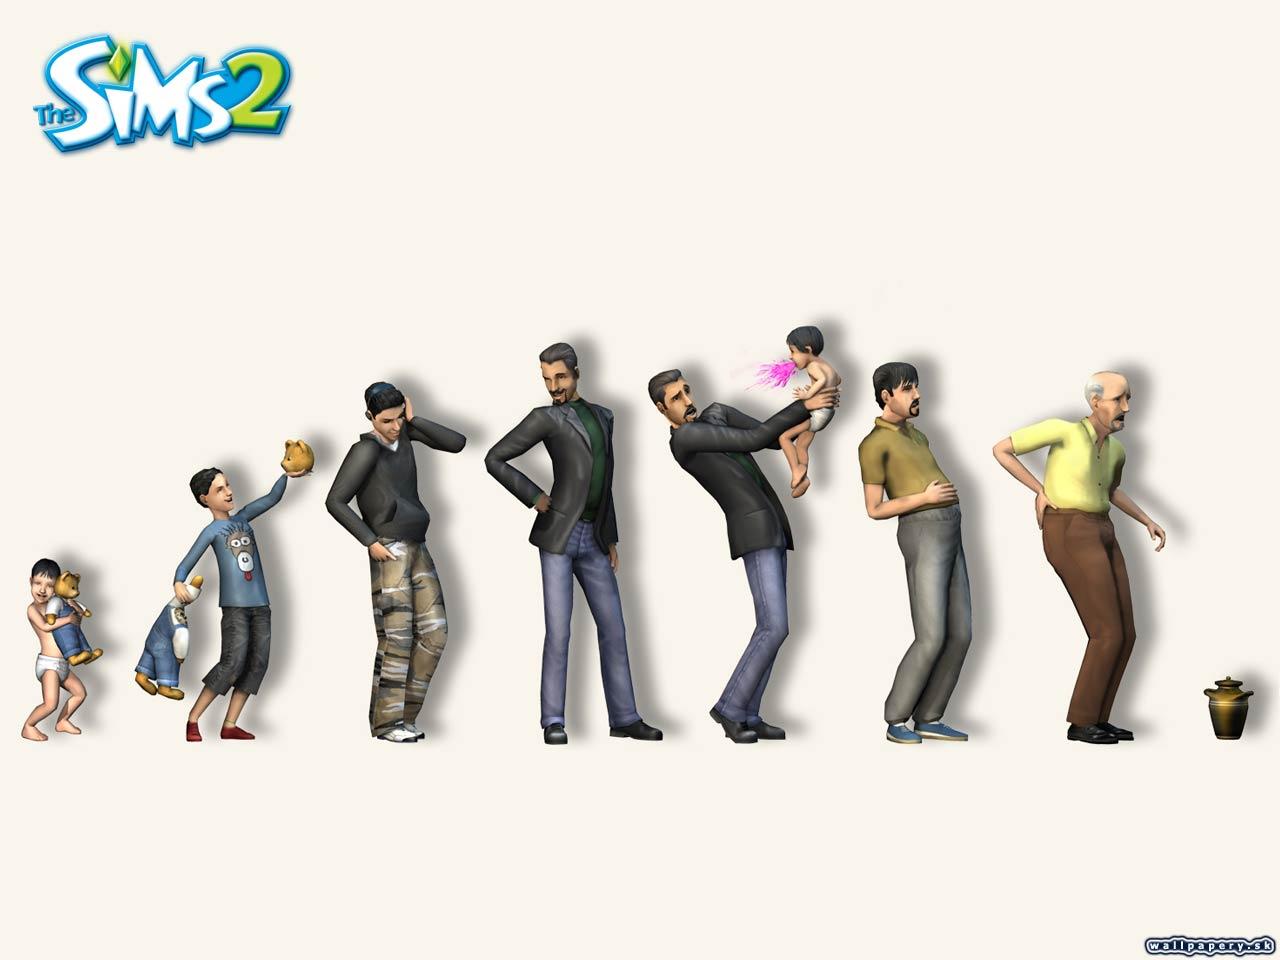 Sims 2 wallpaper